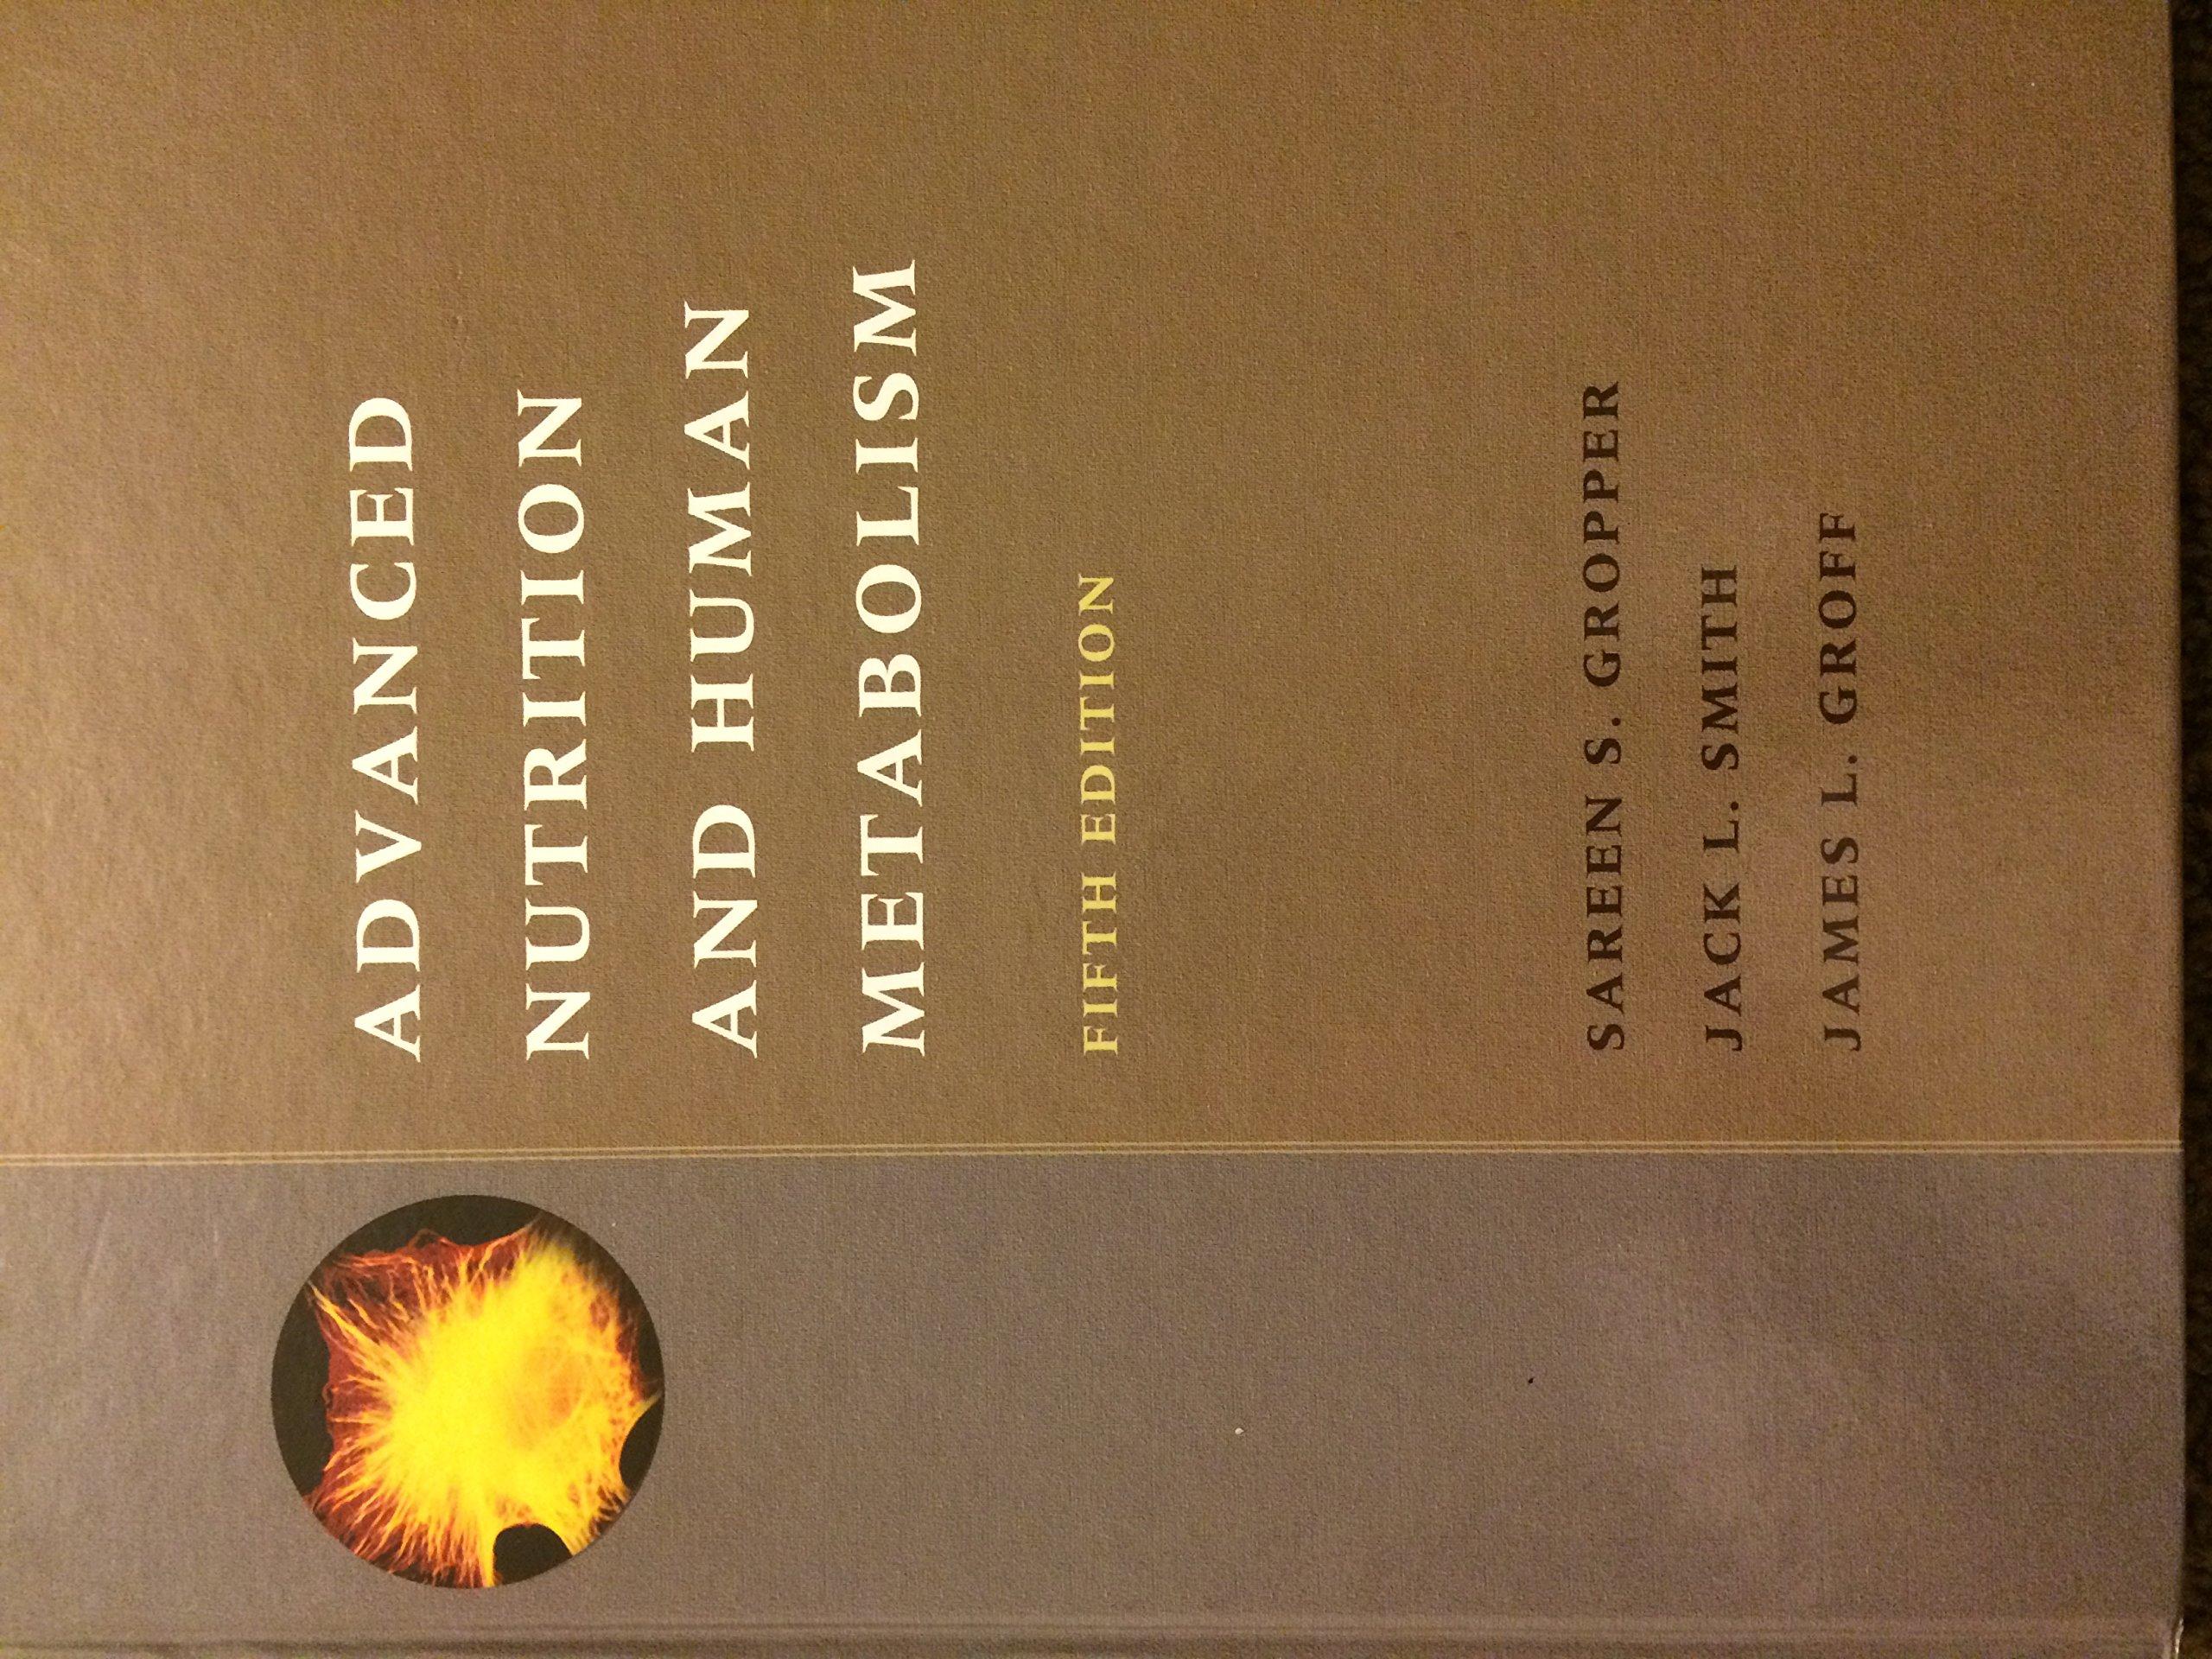 Advanced Nutrition and Human Metabolism 5th edition: Smith: Amazon.com:  Books